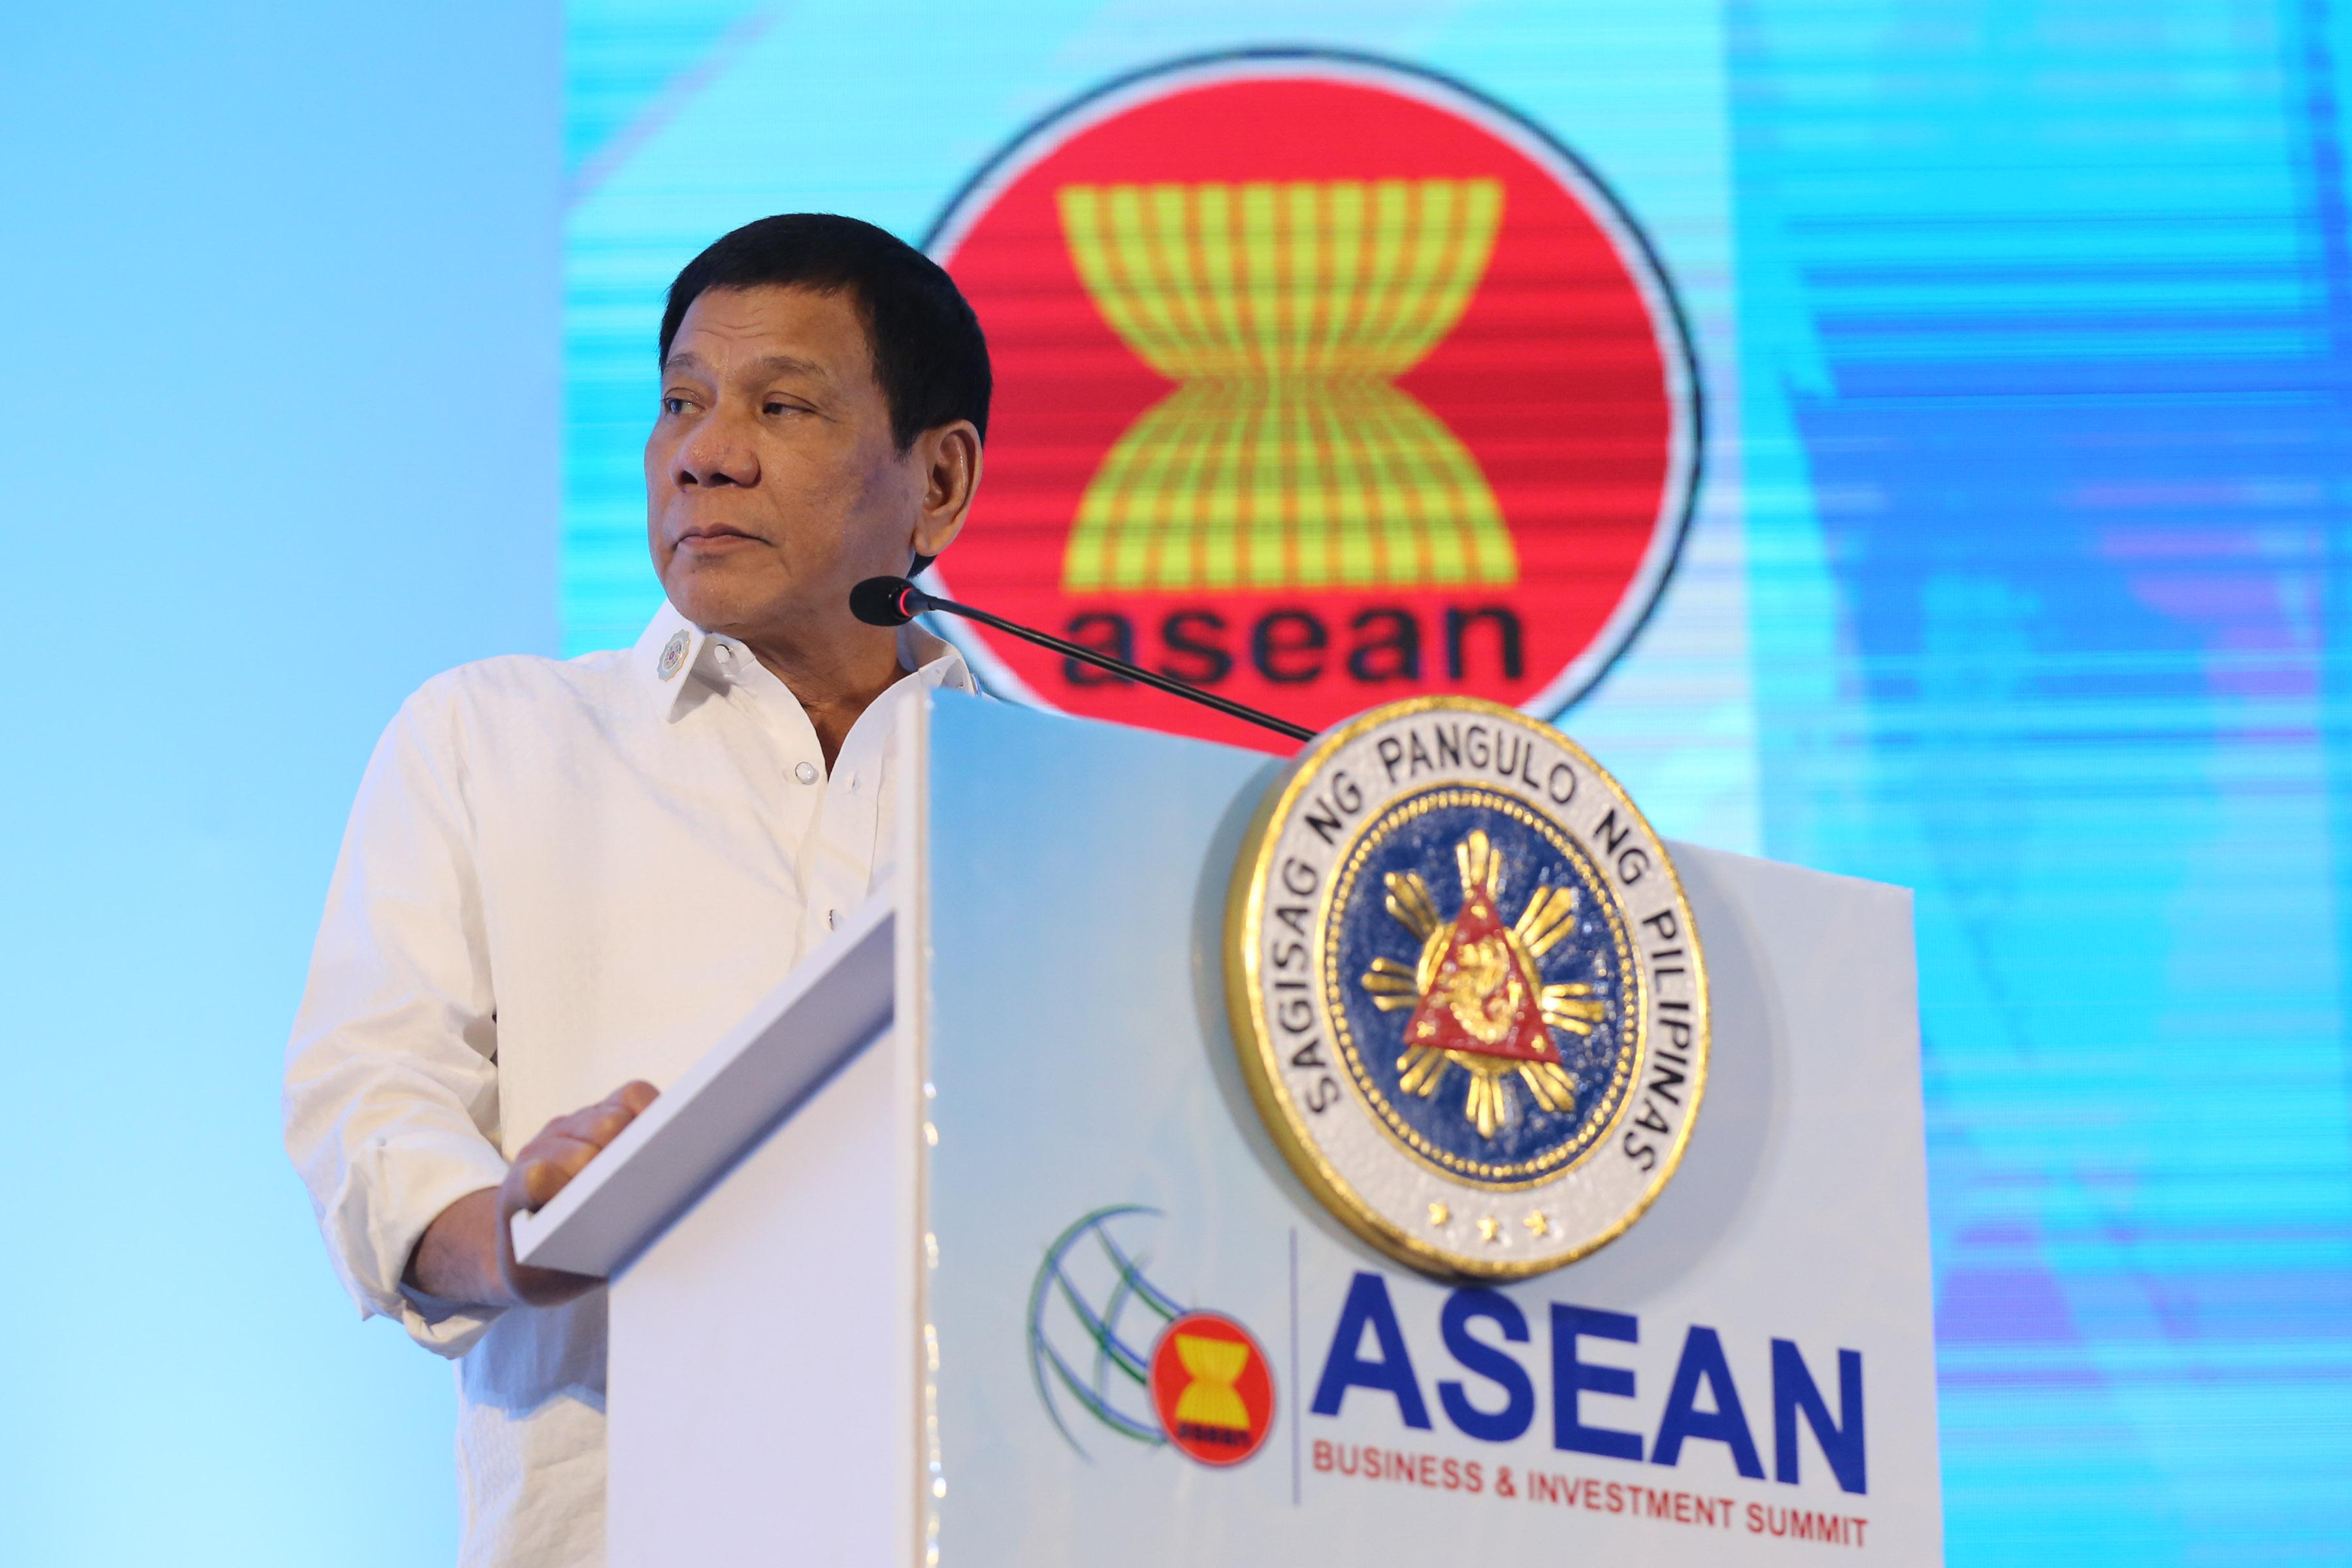 ASEAN-Laos-Duterte-15